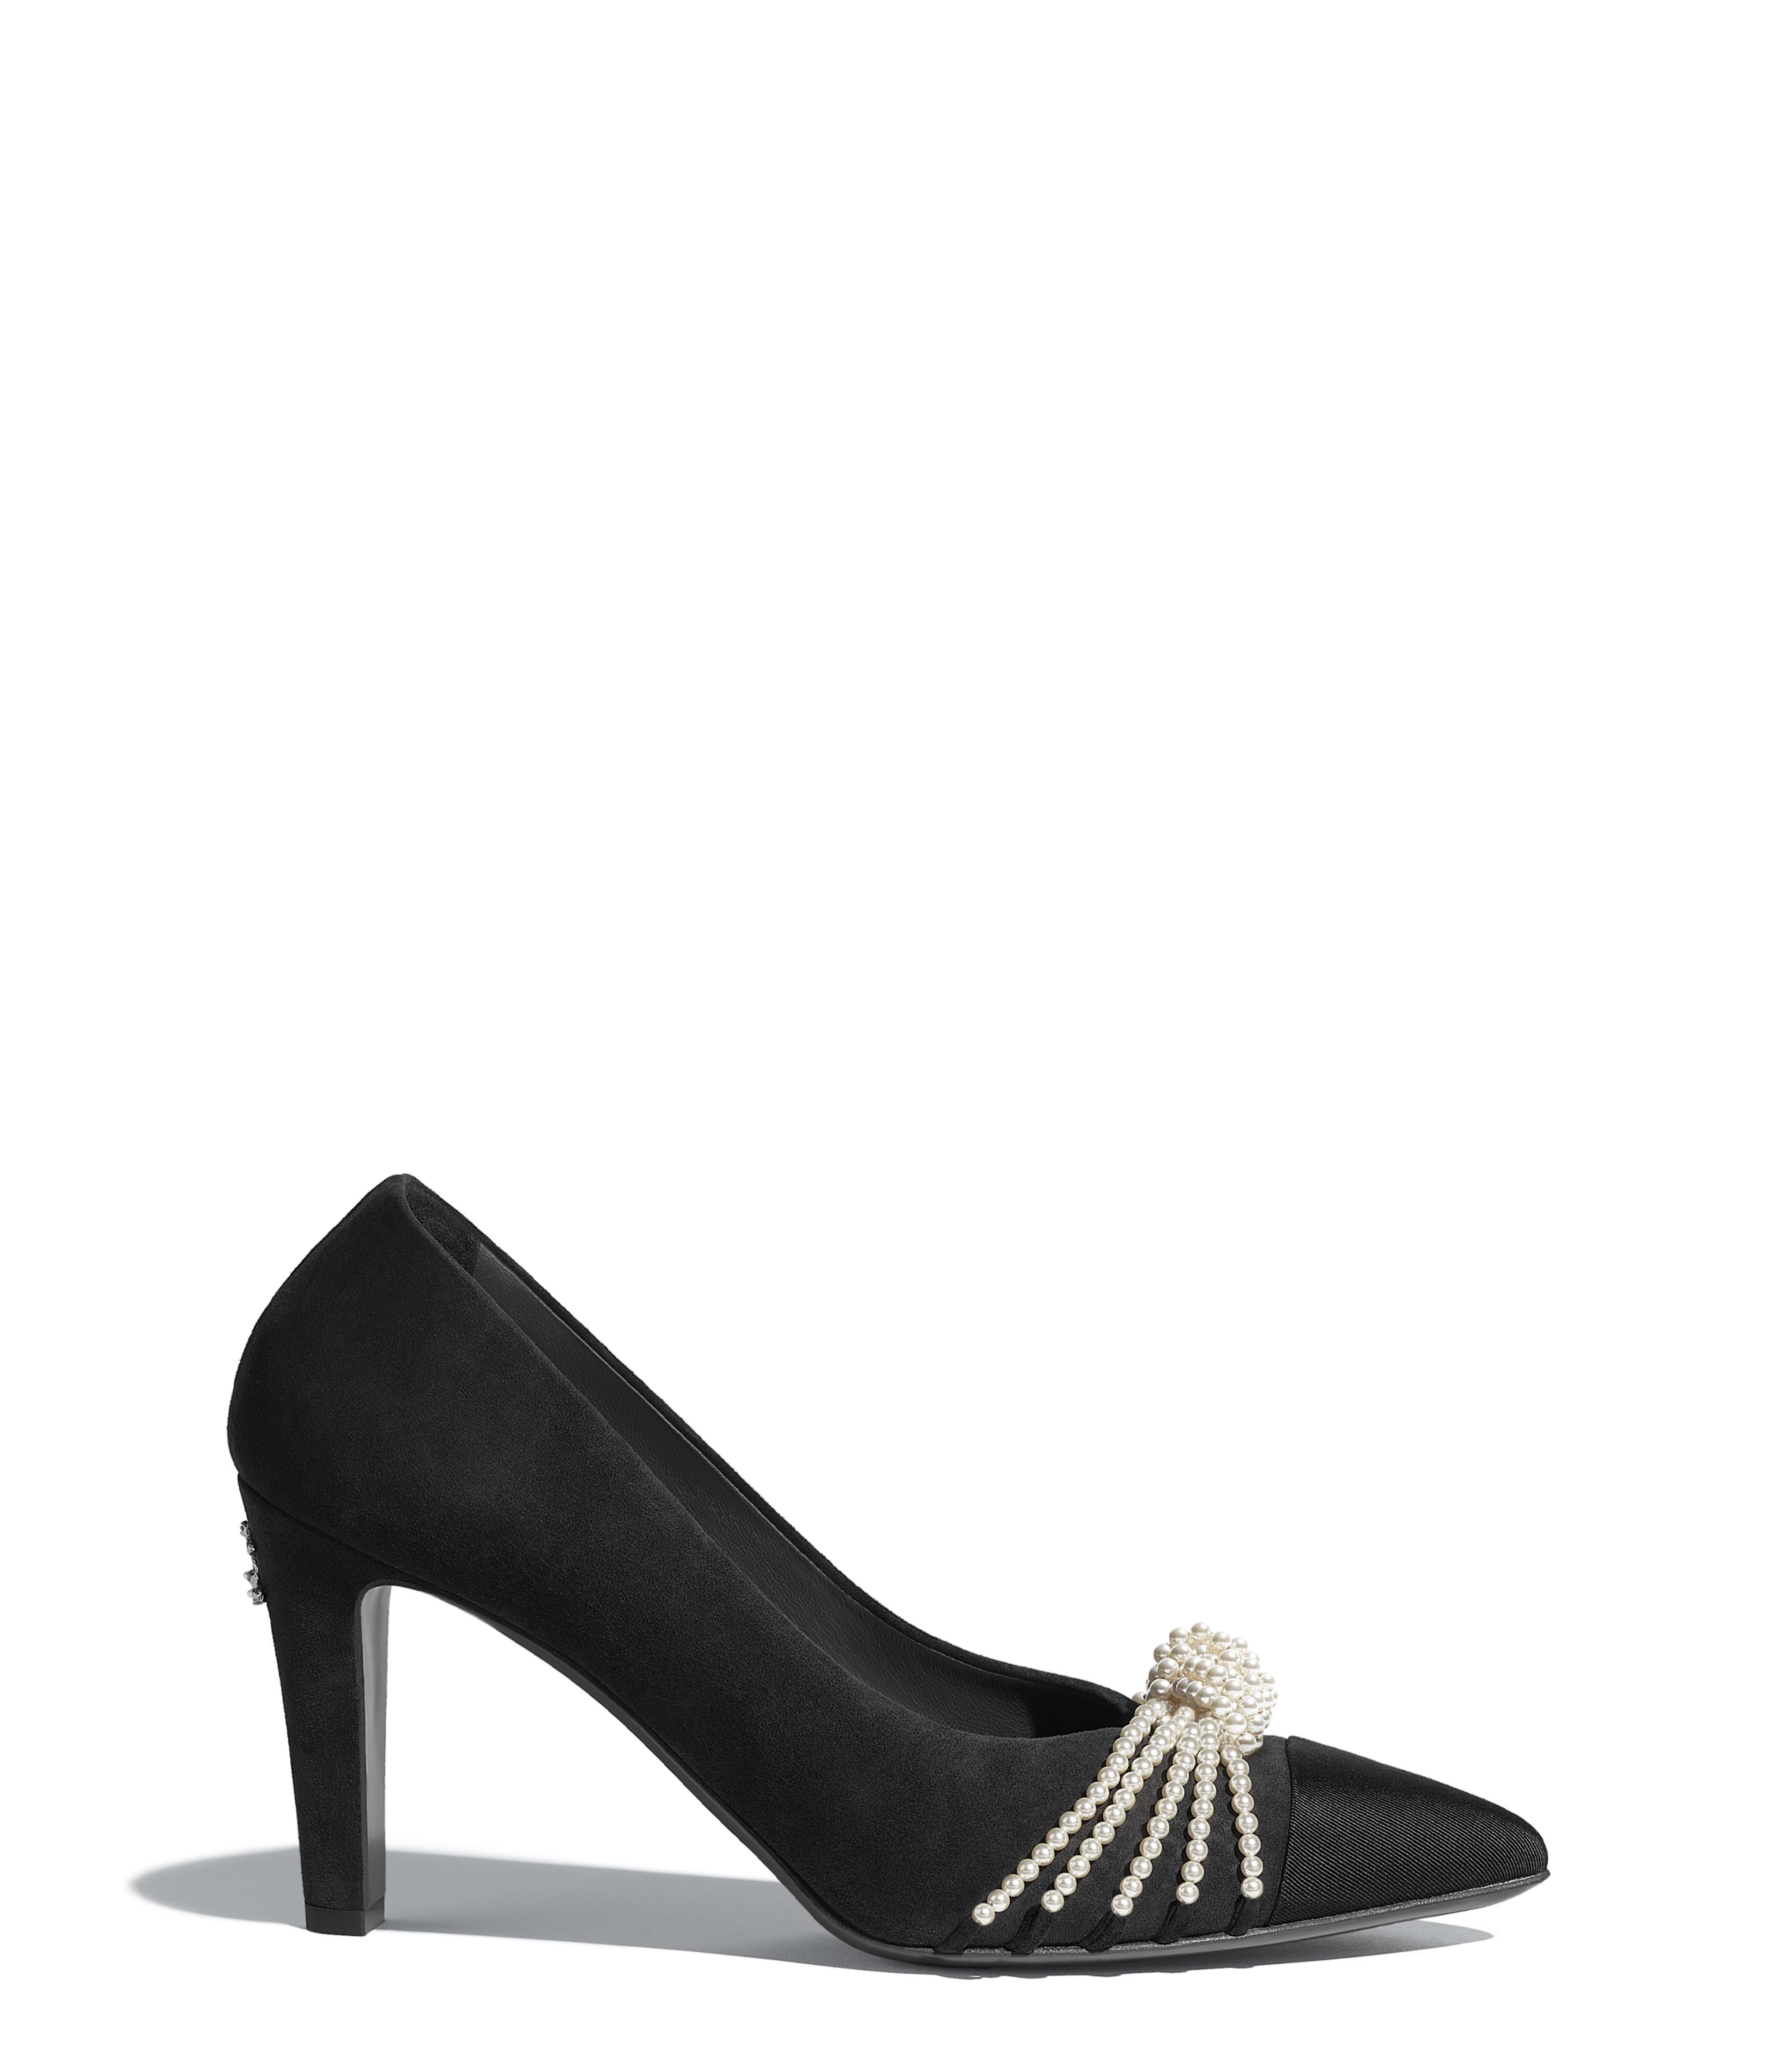 chanel high heels price